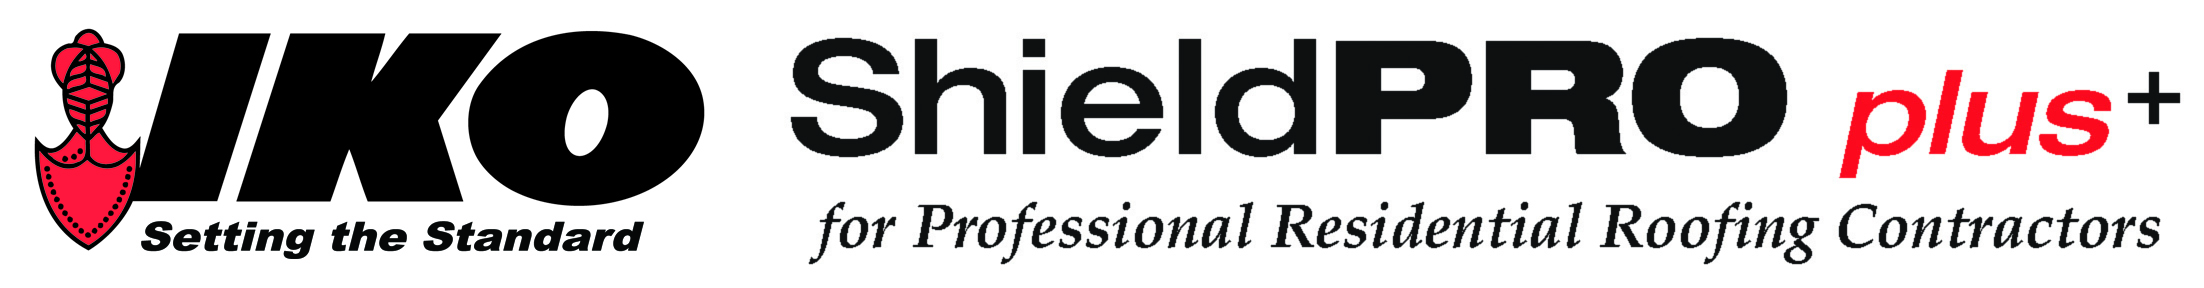 IKO-ShieldPRO-plus-logo_print-jpg